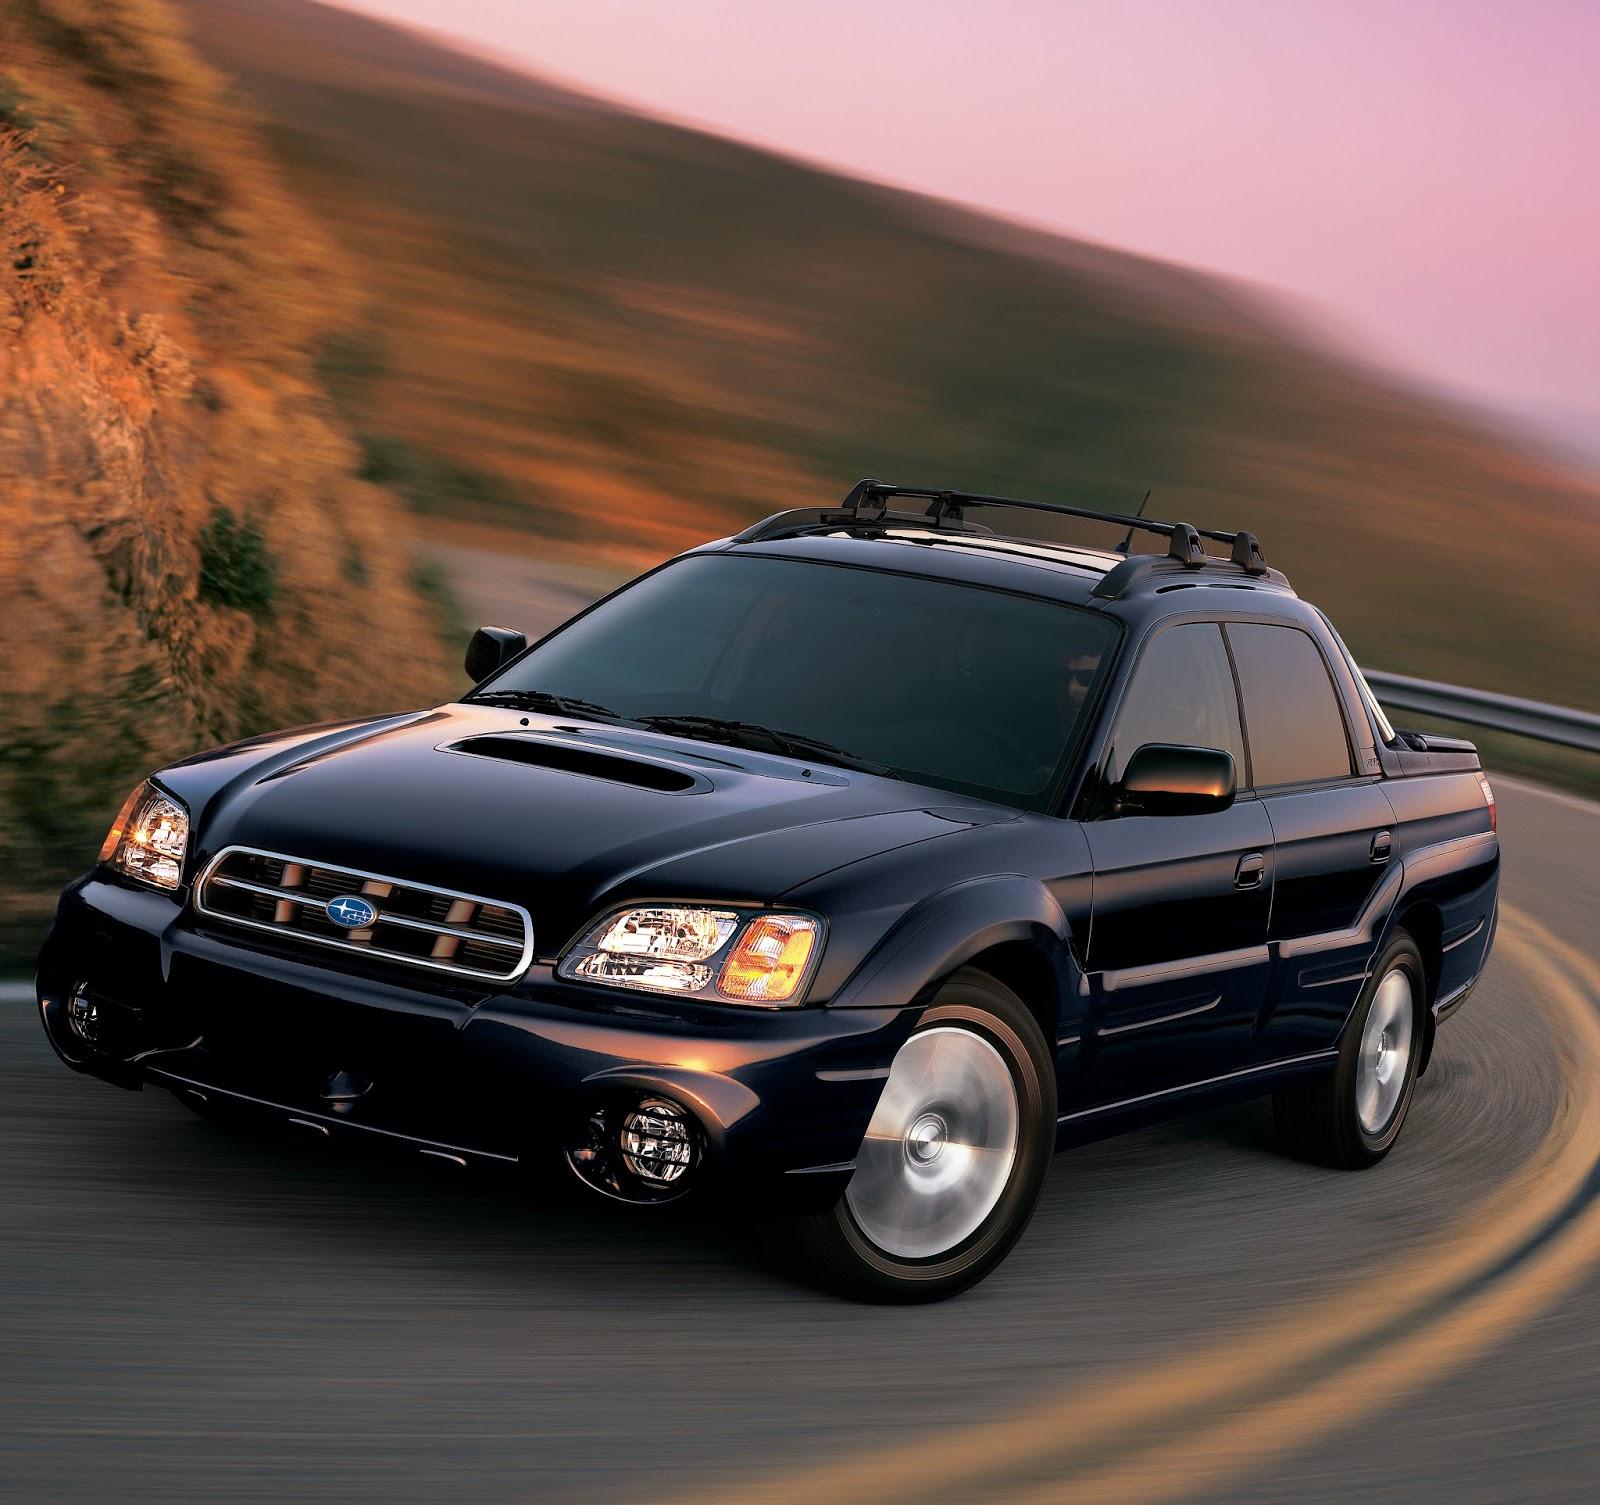 The Motoring World The Celebrations Start Now As Subaru